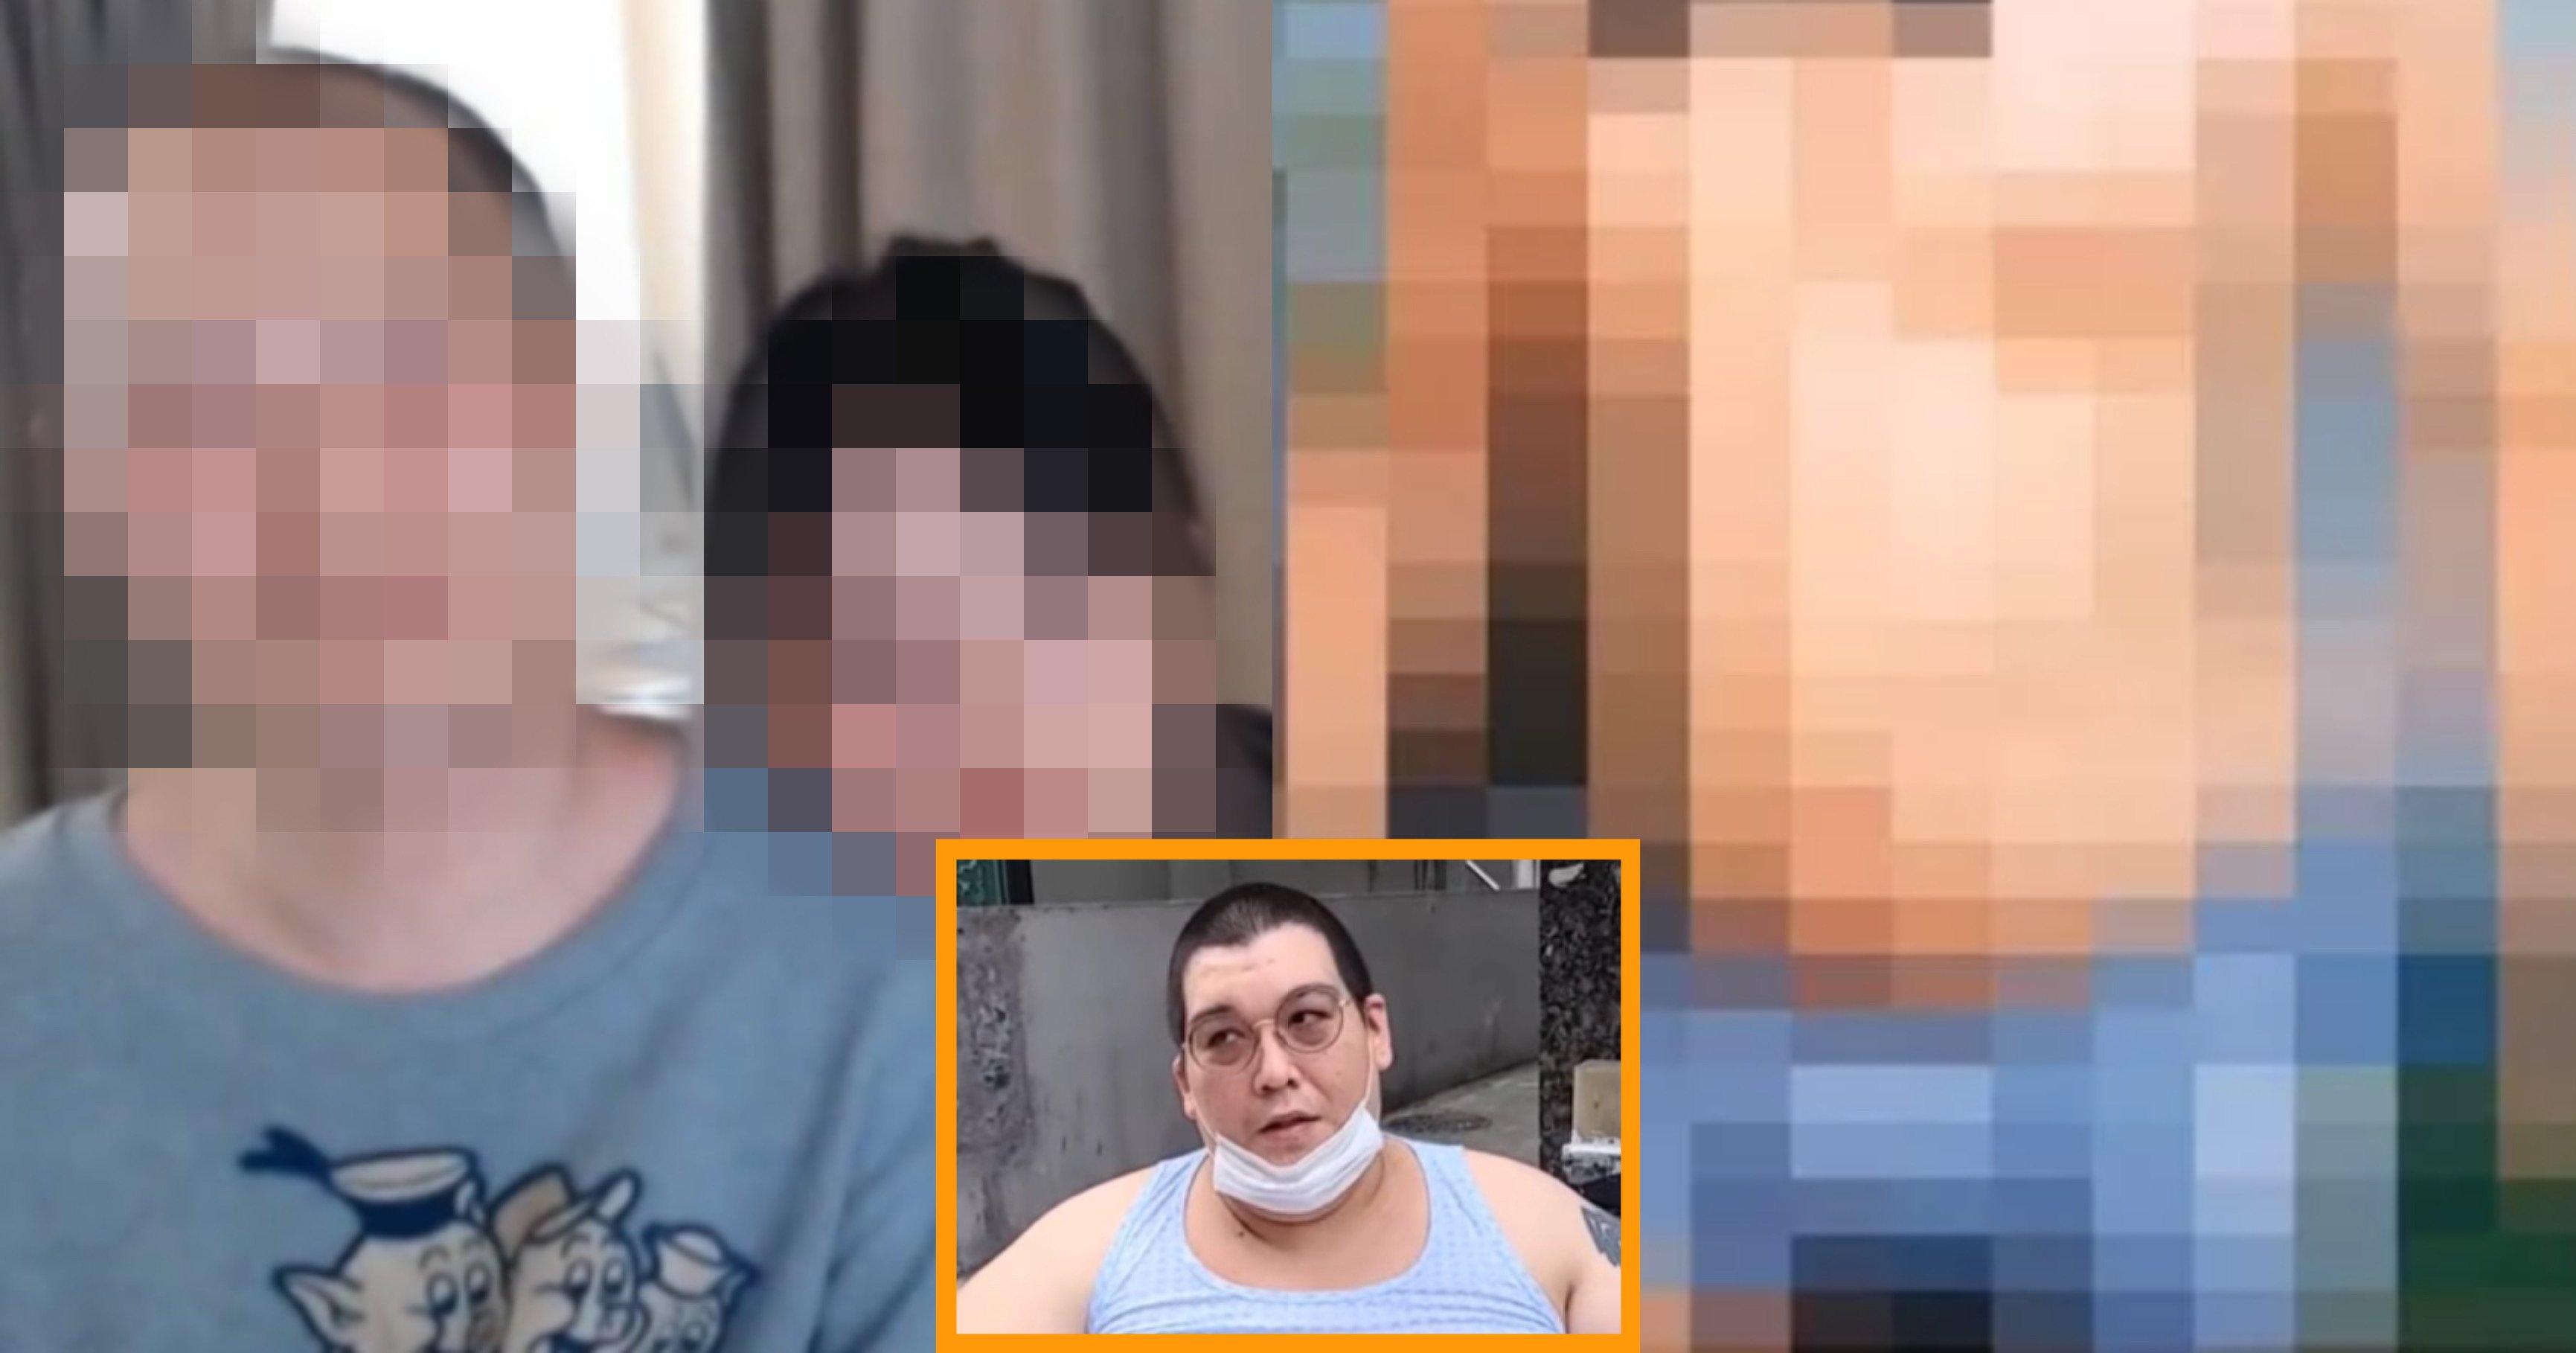 "a7953157 45ce 4a28 9308 6a88beec4f49.jpeg?resize=1200,630 - ""고인 노래틀고 '팬티 댄스' 리액션""… 네티즌들 사이에서 논란되고 있는 성인BJ (영상)"